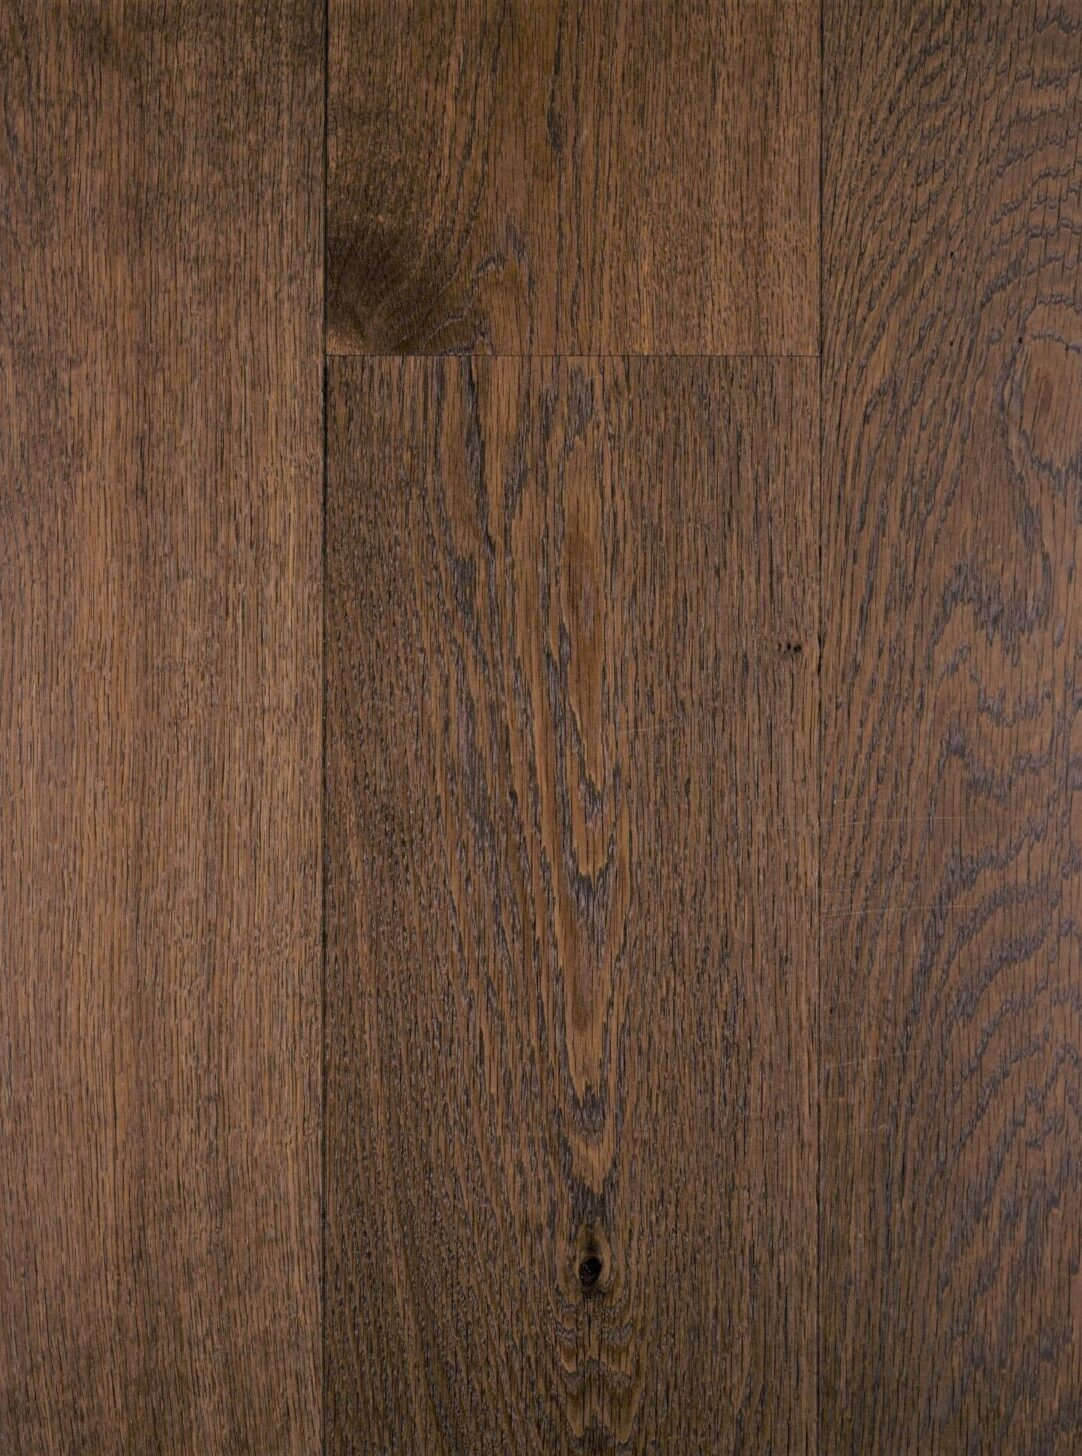 Dark oak flooring landmark knole